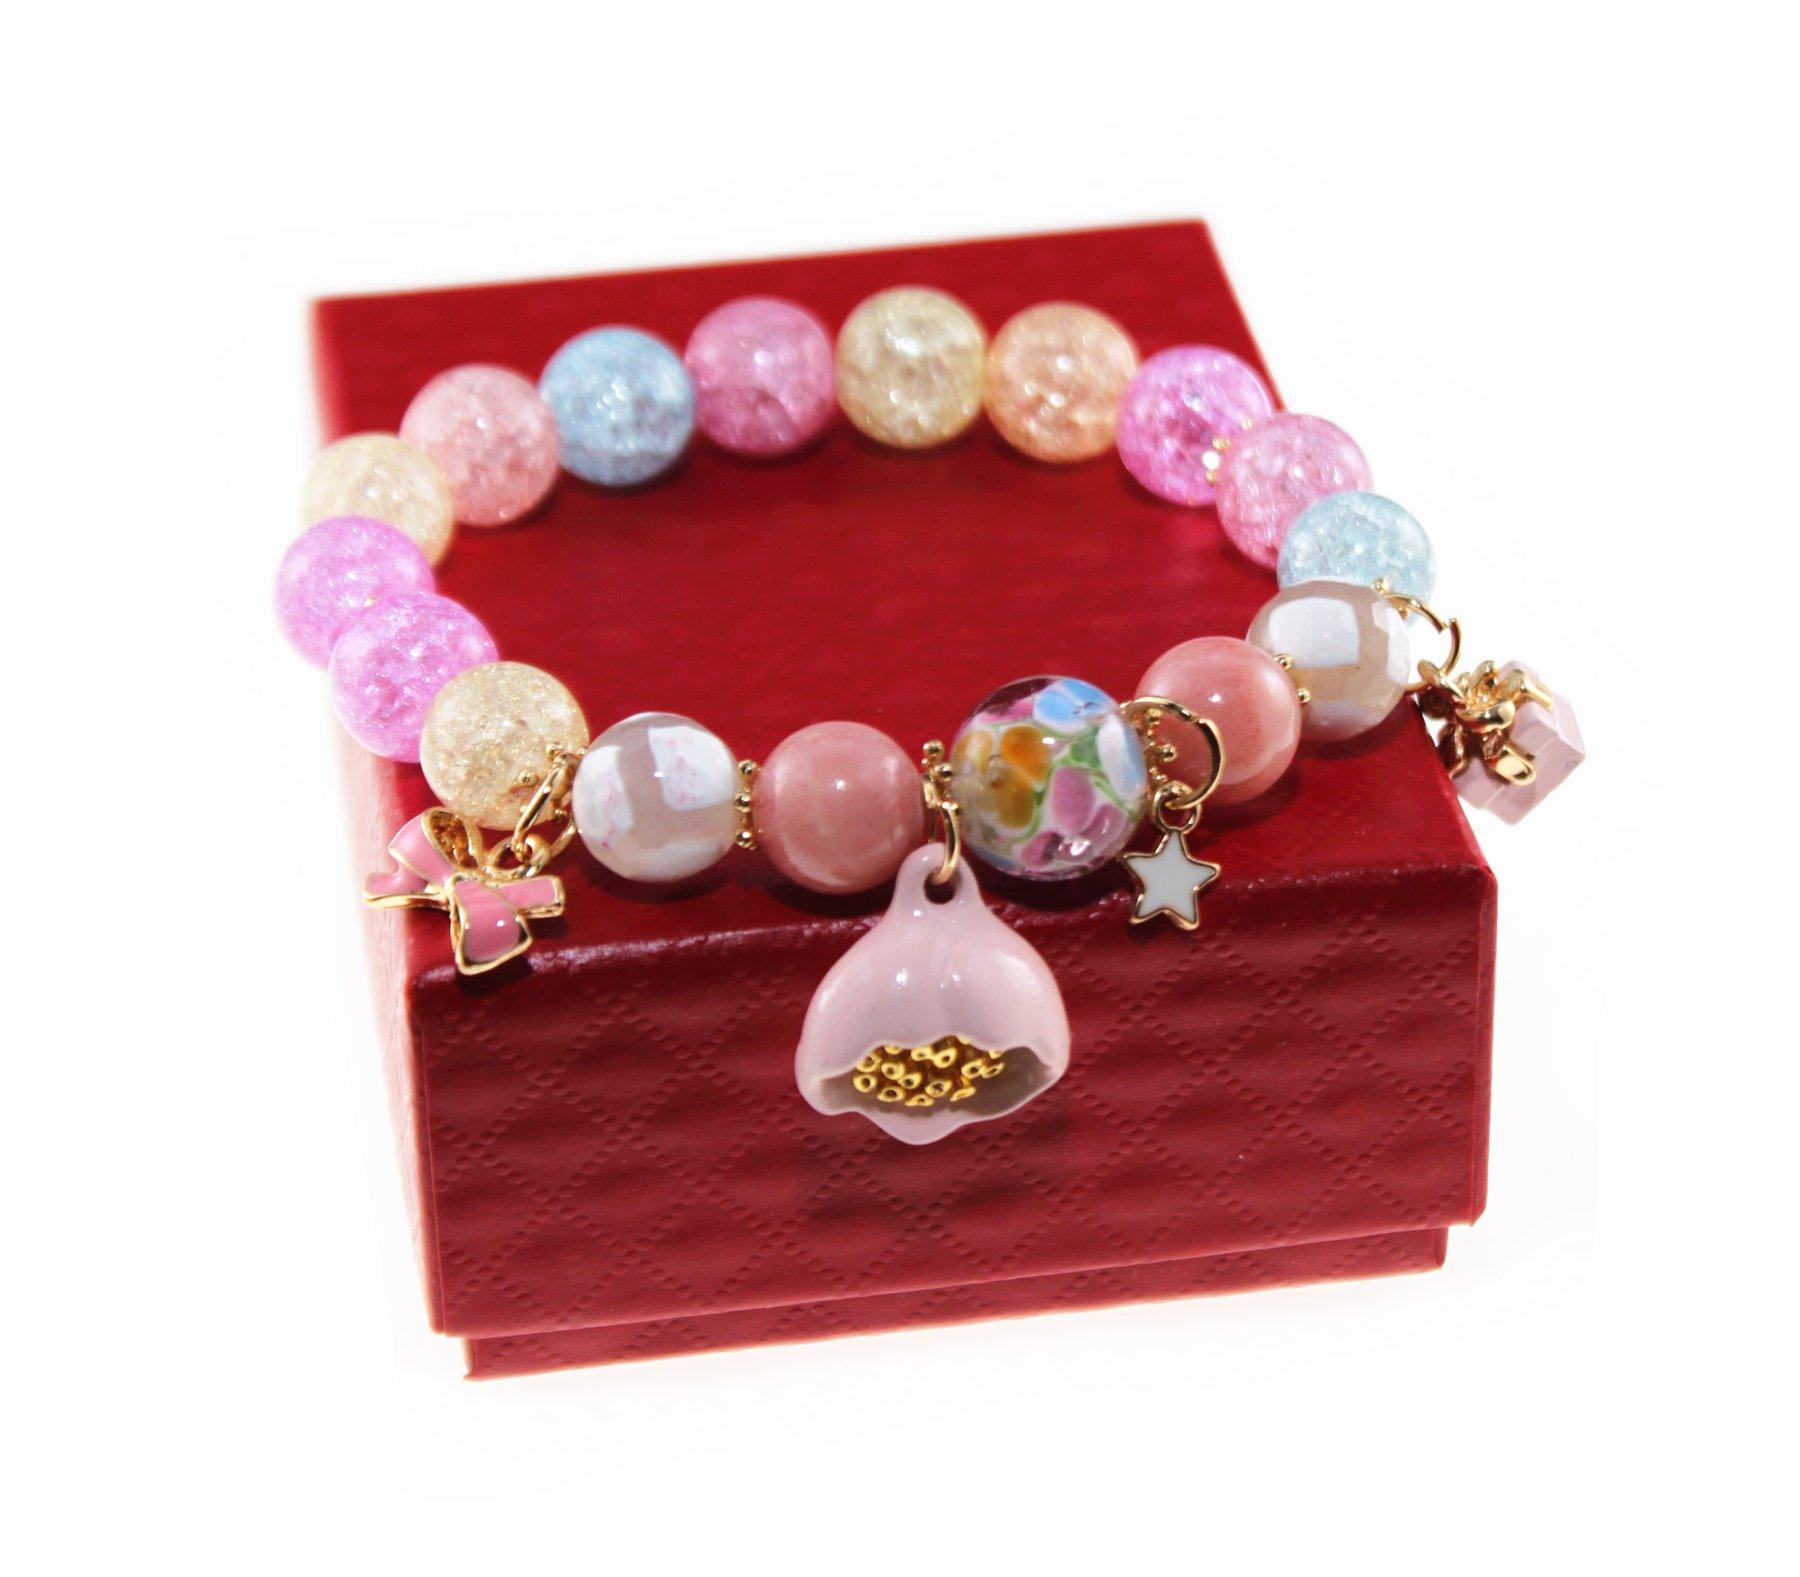 Ice Crack Korean Style Crystal & Colored Glaze Charm Bracelet with Lotus Pendant (Colorful)